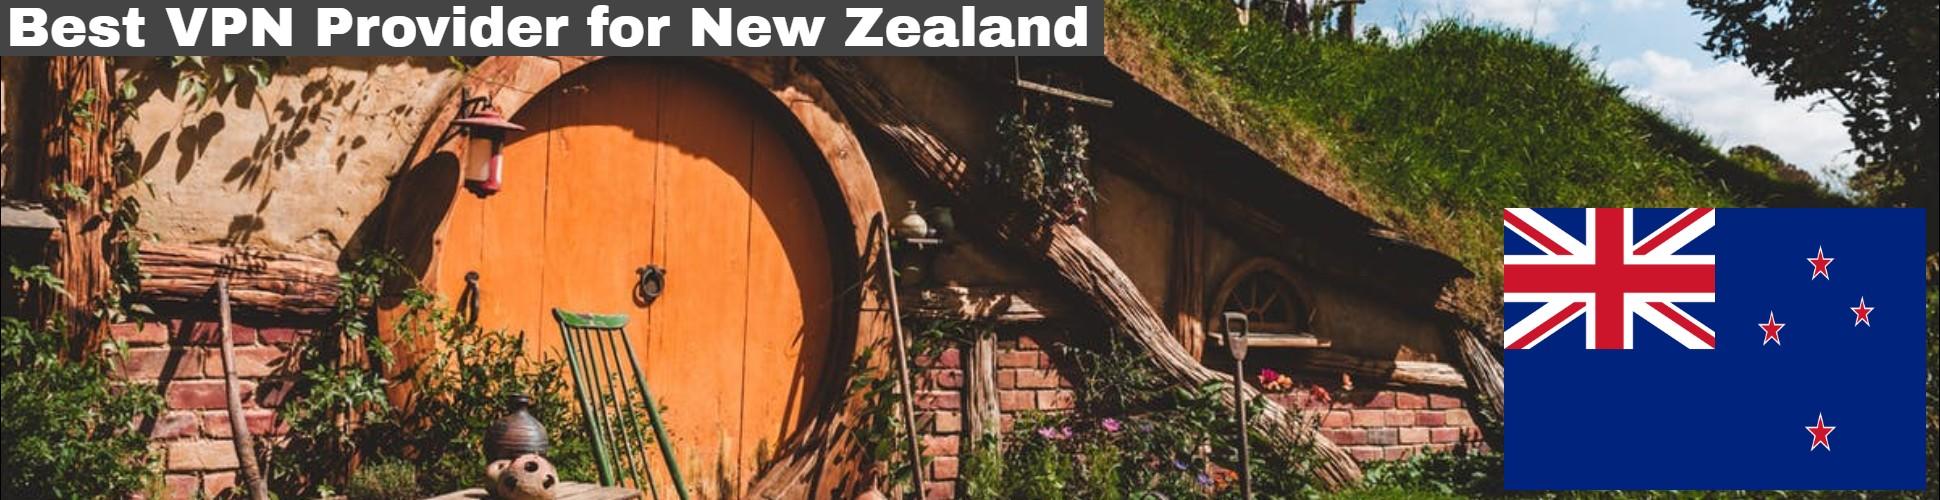 Best VPN For New Zealand